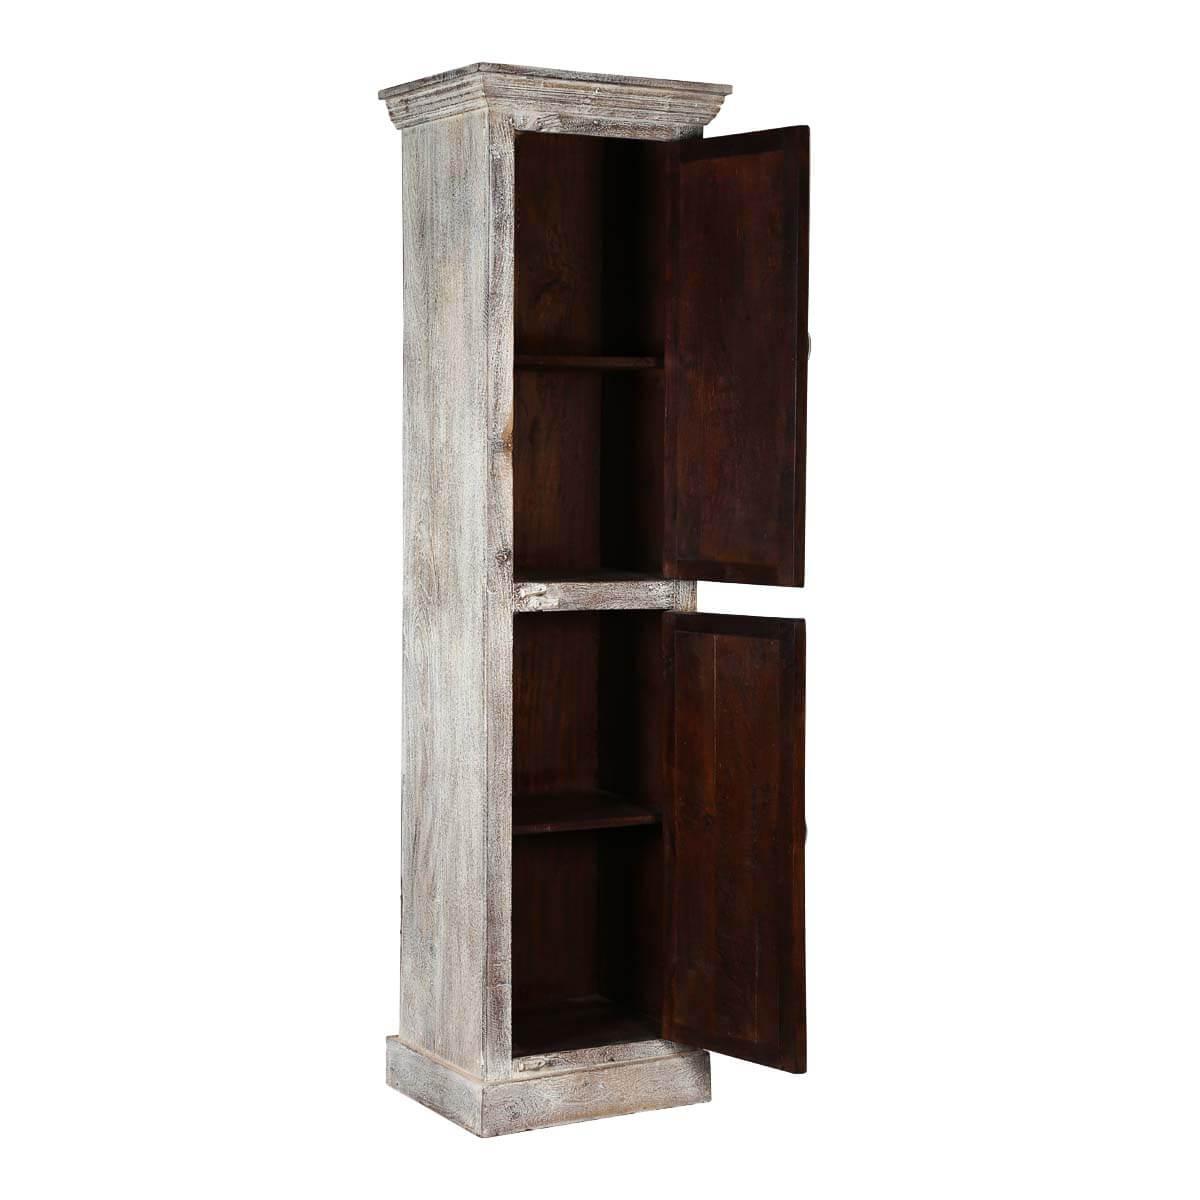 Barneston Distressed Reclaimed Wood 2 Door Tall Accent Cabinet